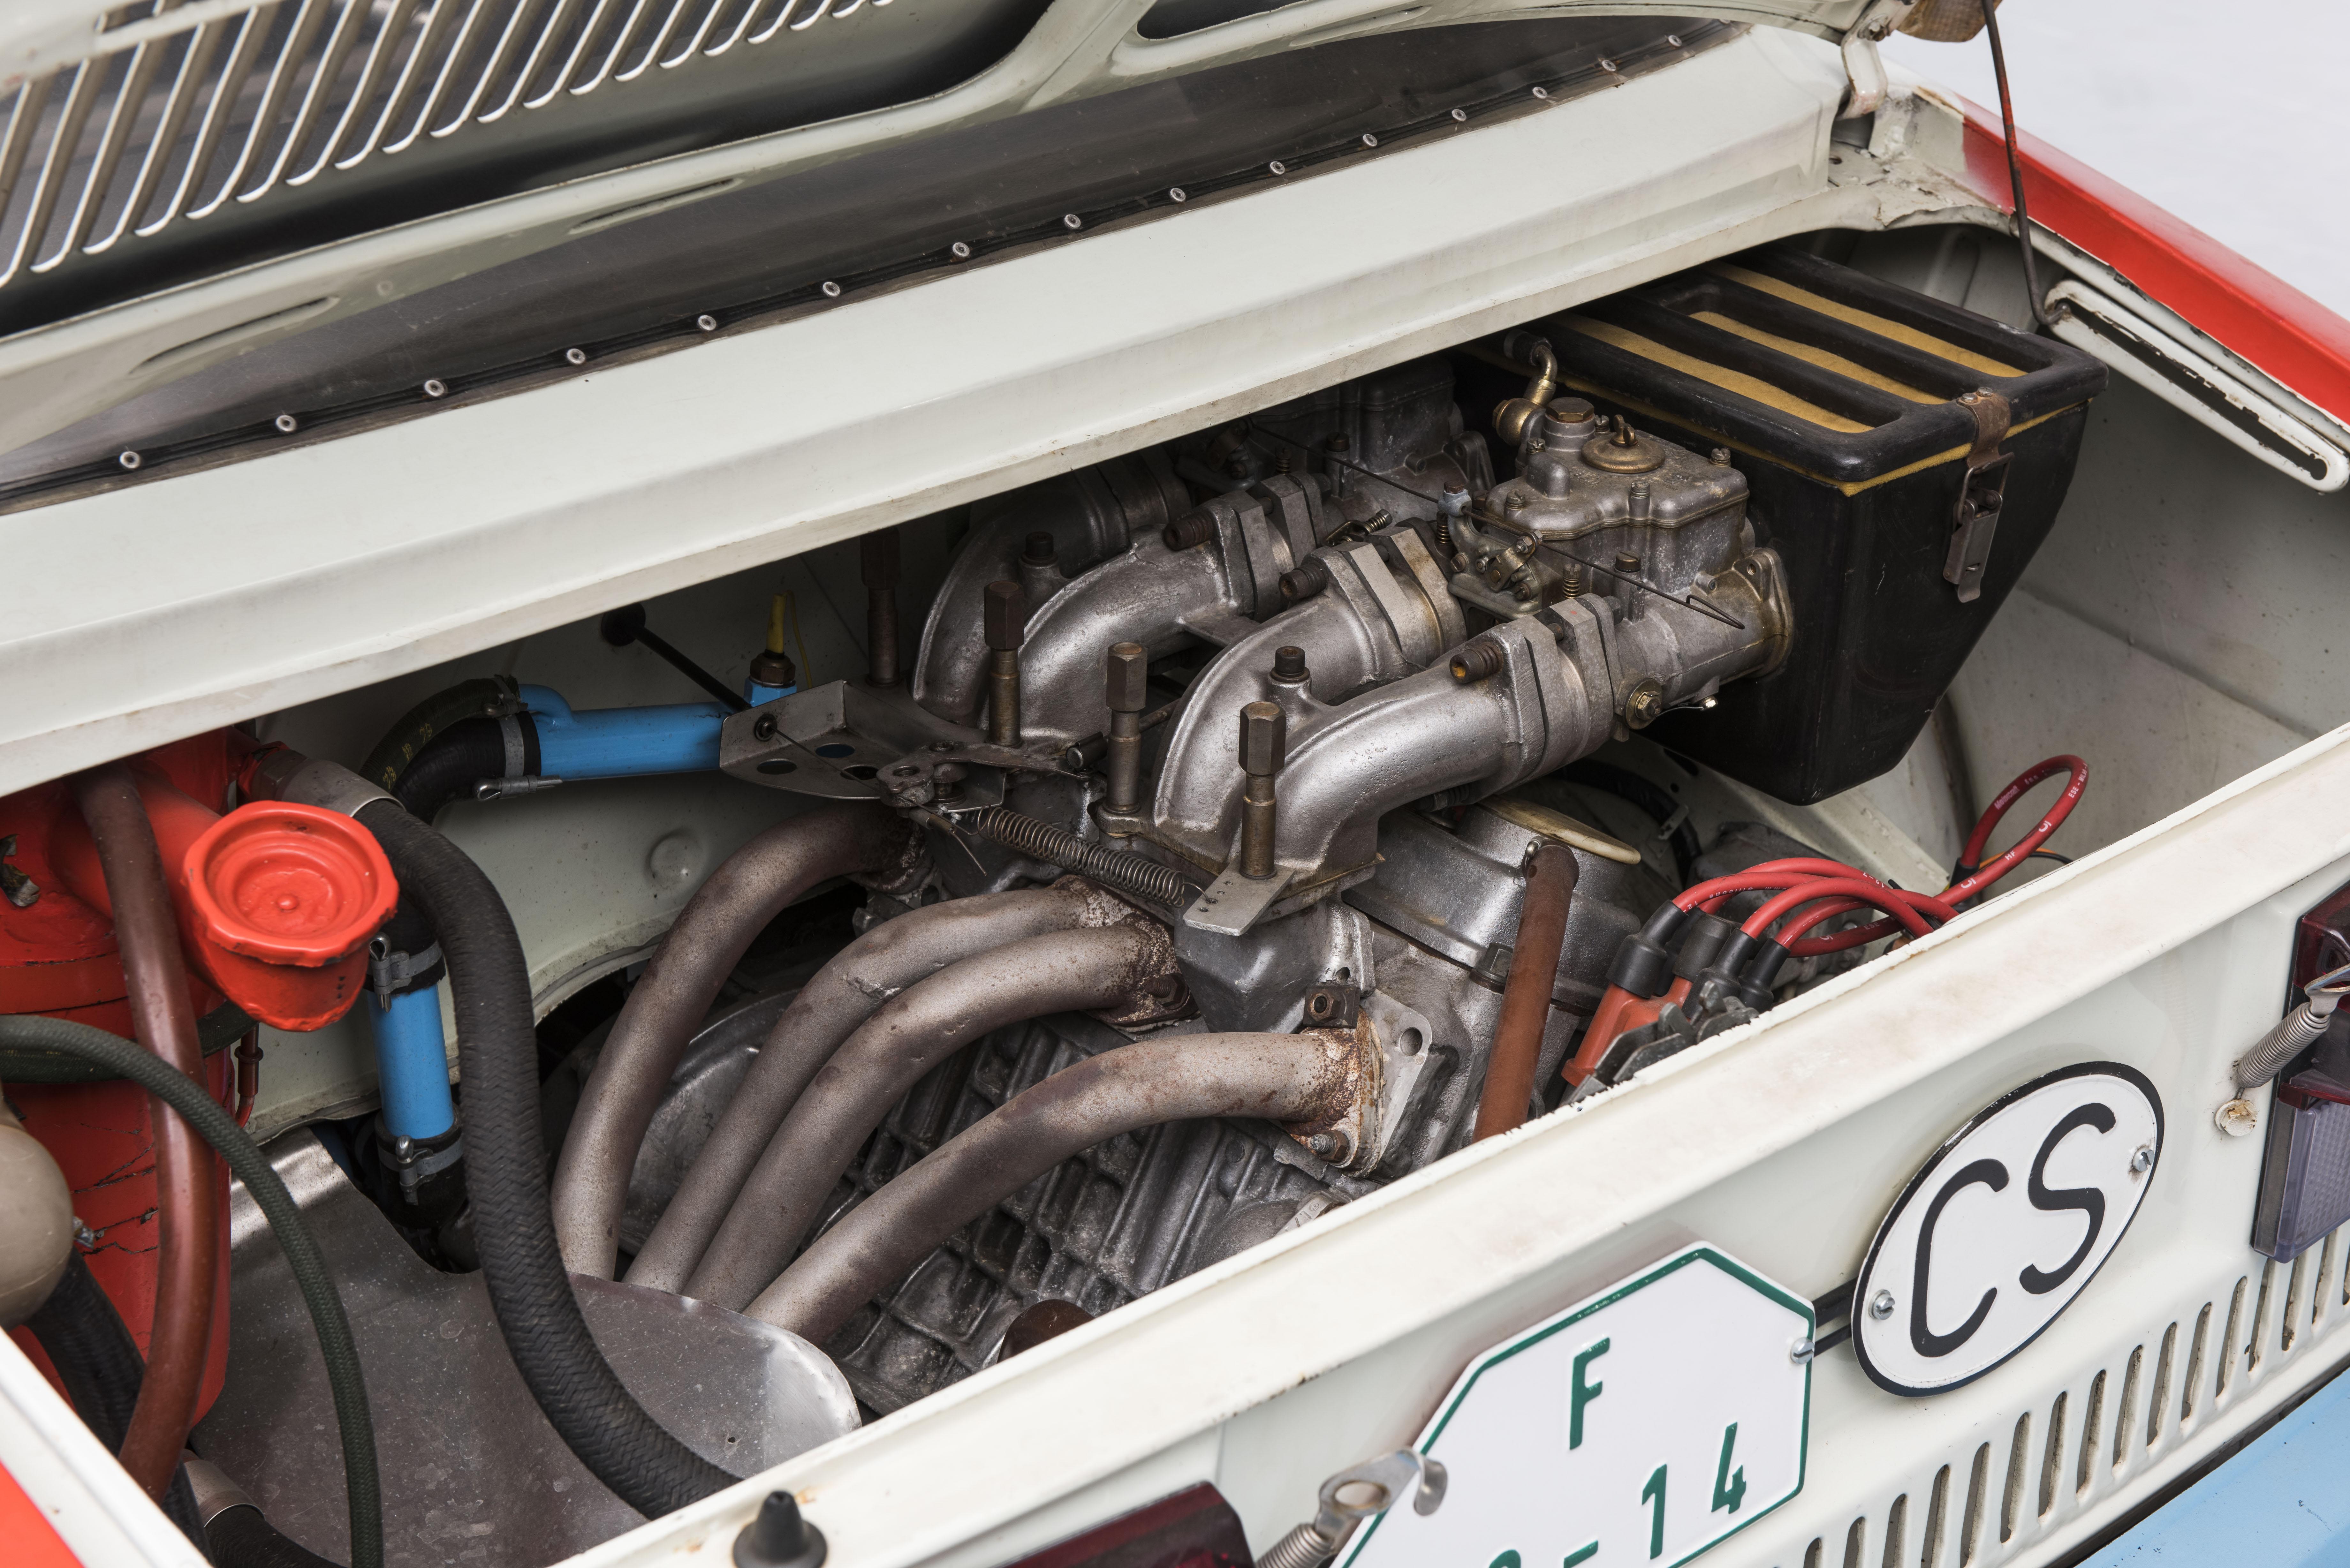 SKODA 130 LR (1984): Last motorsport model from Mladá Boleslav with rear-mounted engine - Image 7